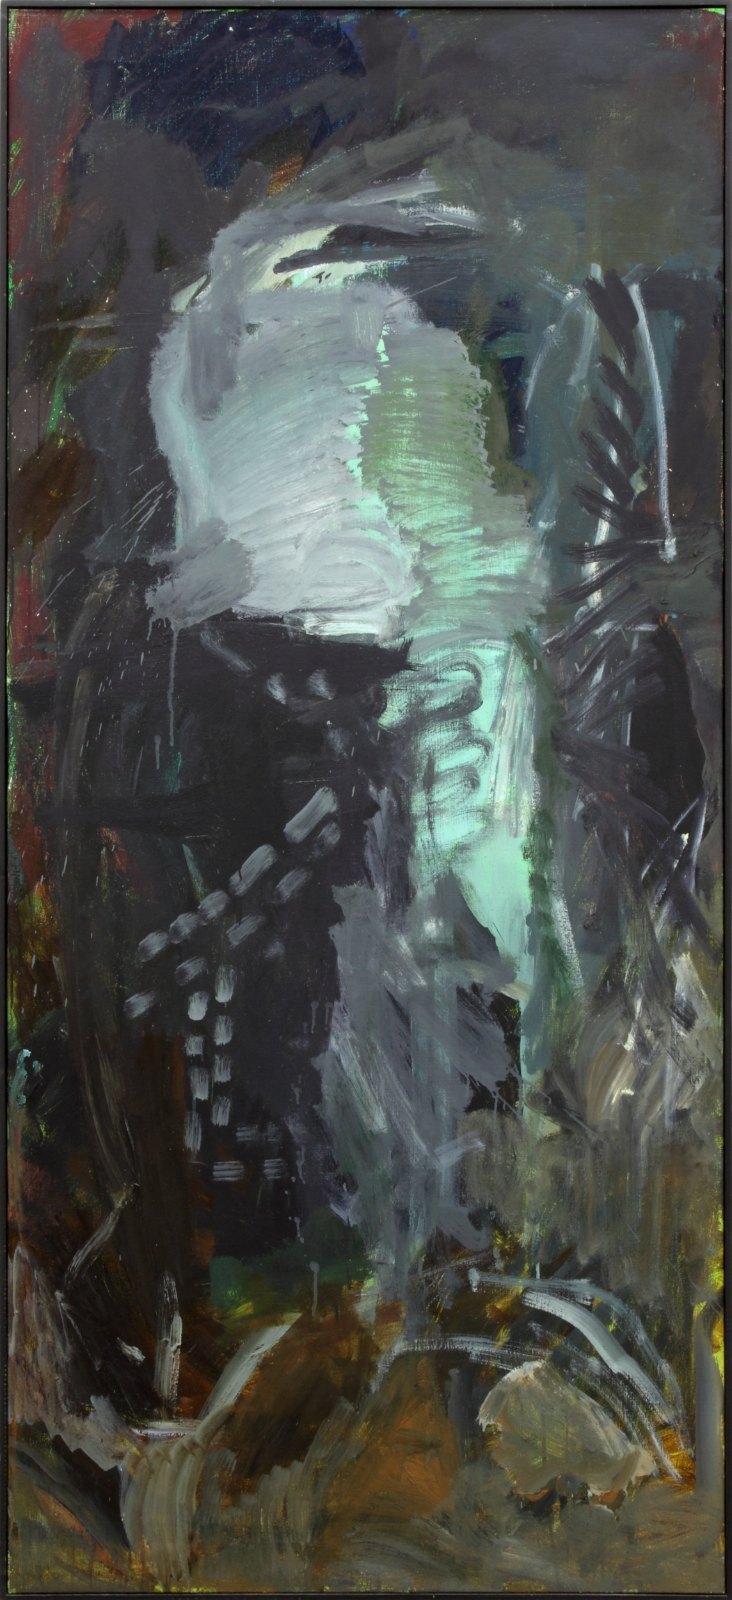 Per Kirkeby, Byzantinsk, 1983, oil on canvas, 200 x 90 cm